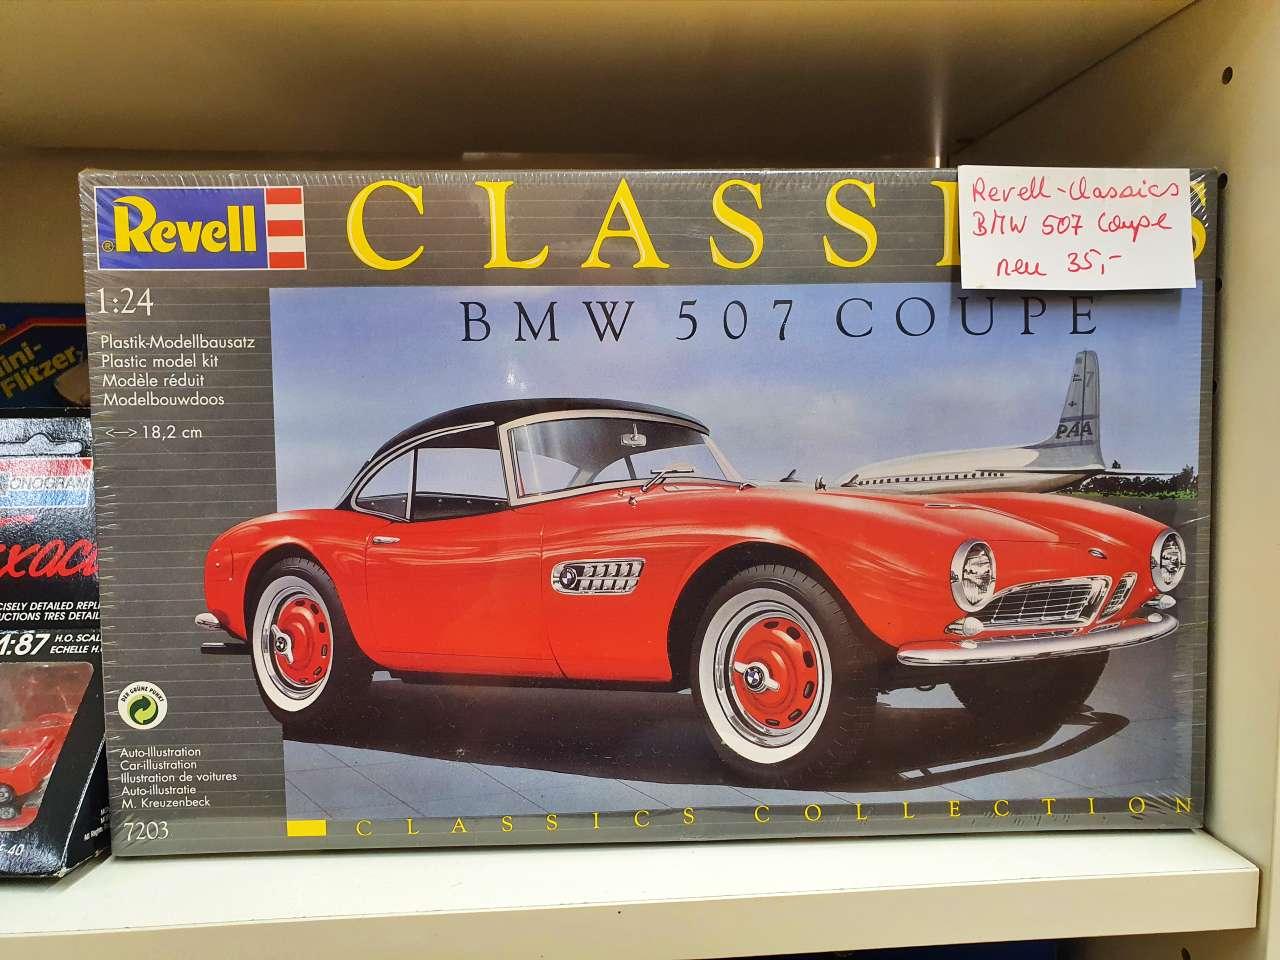 Sammlerstücke Revell-Classics BMW 507 Coupe